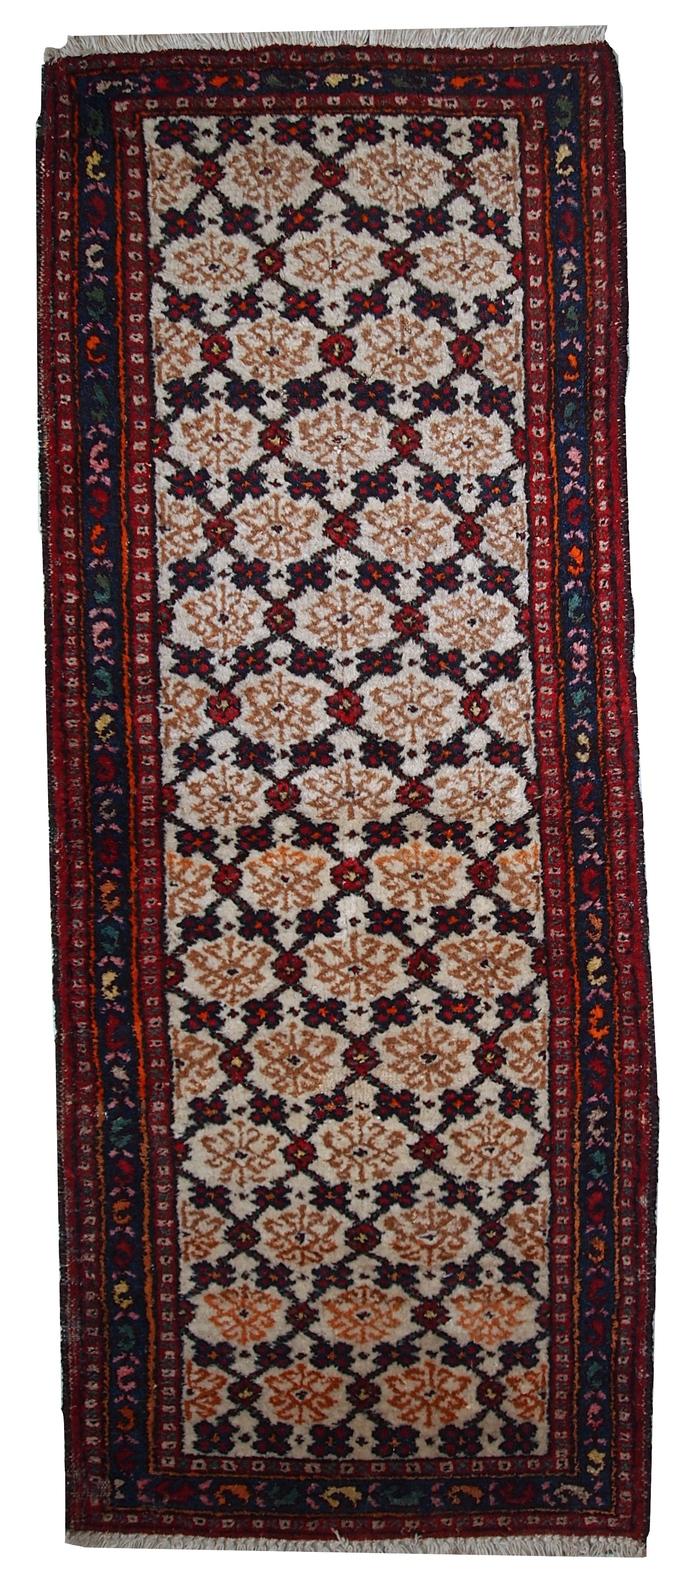 Handmade vintage Persian Hamadan runner 2.6' x 6.8' ( 80cm x 207cm ) 1960s -